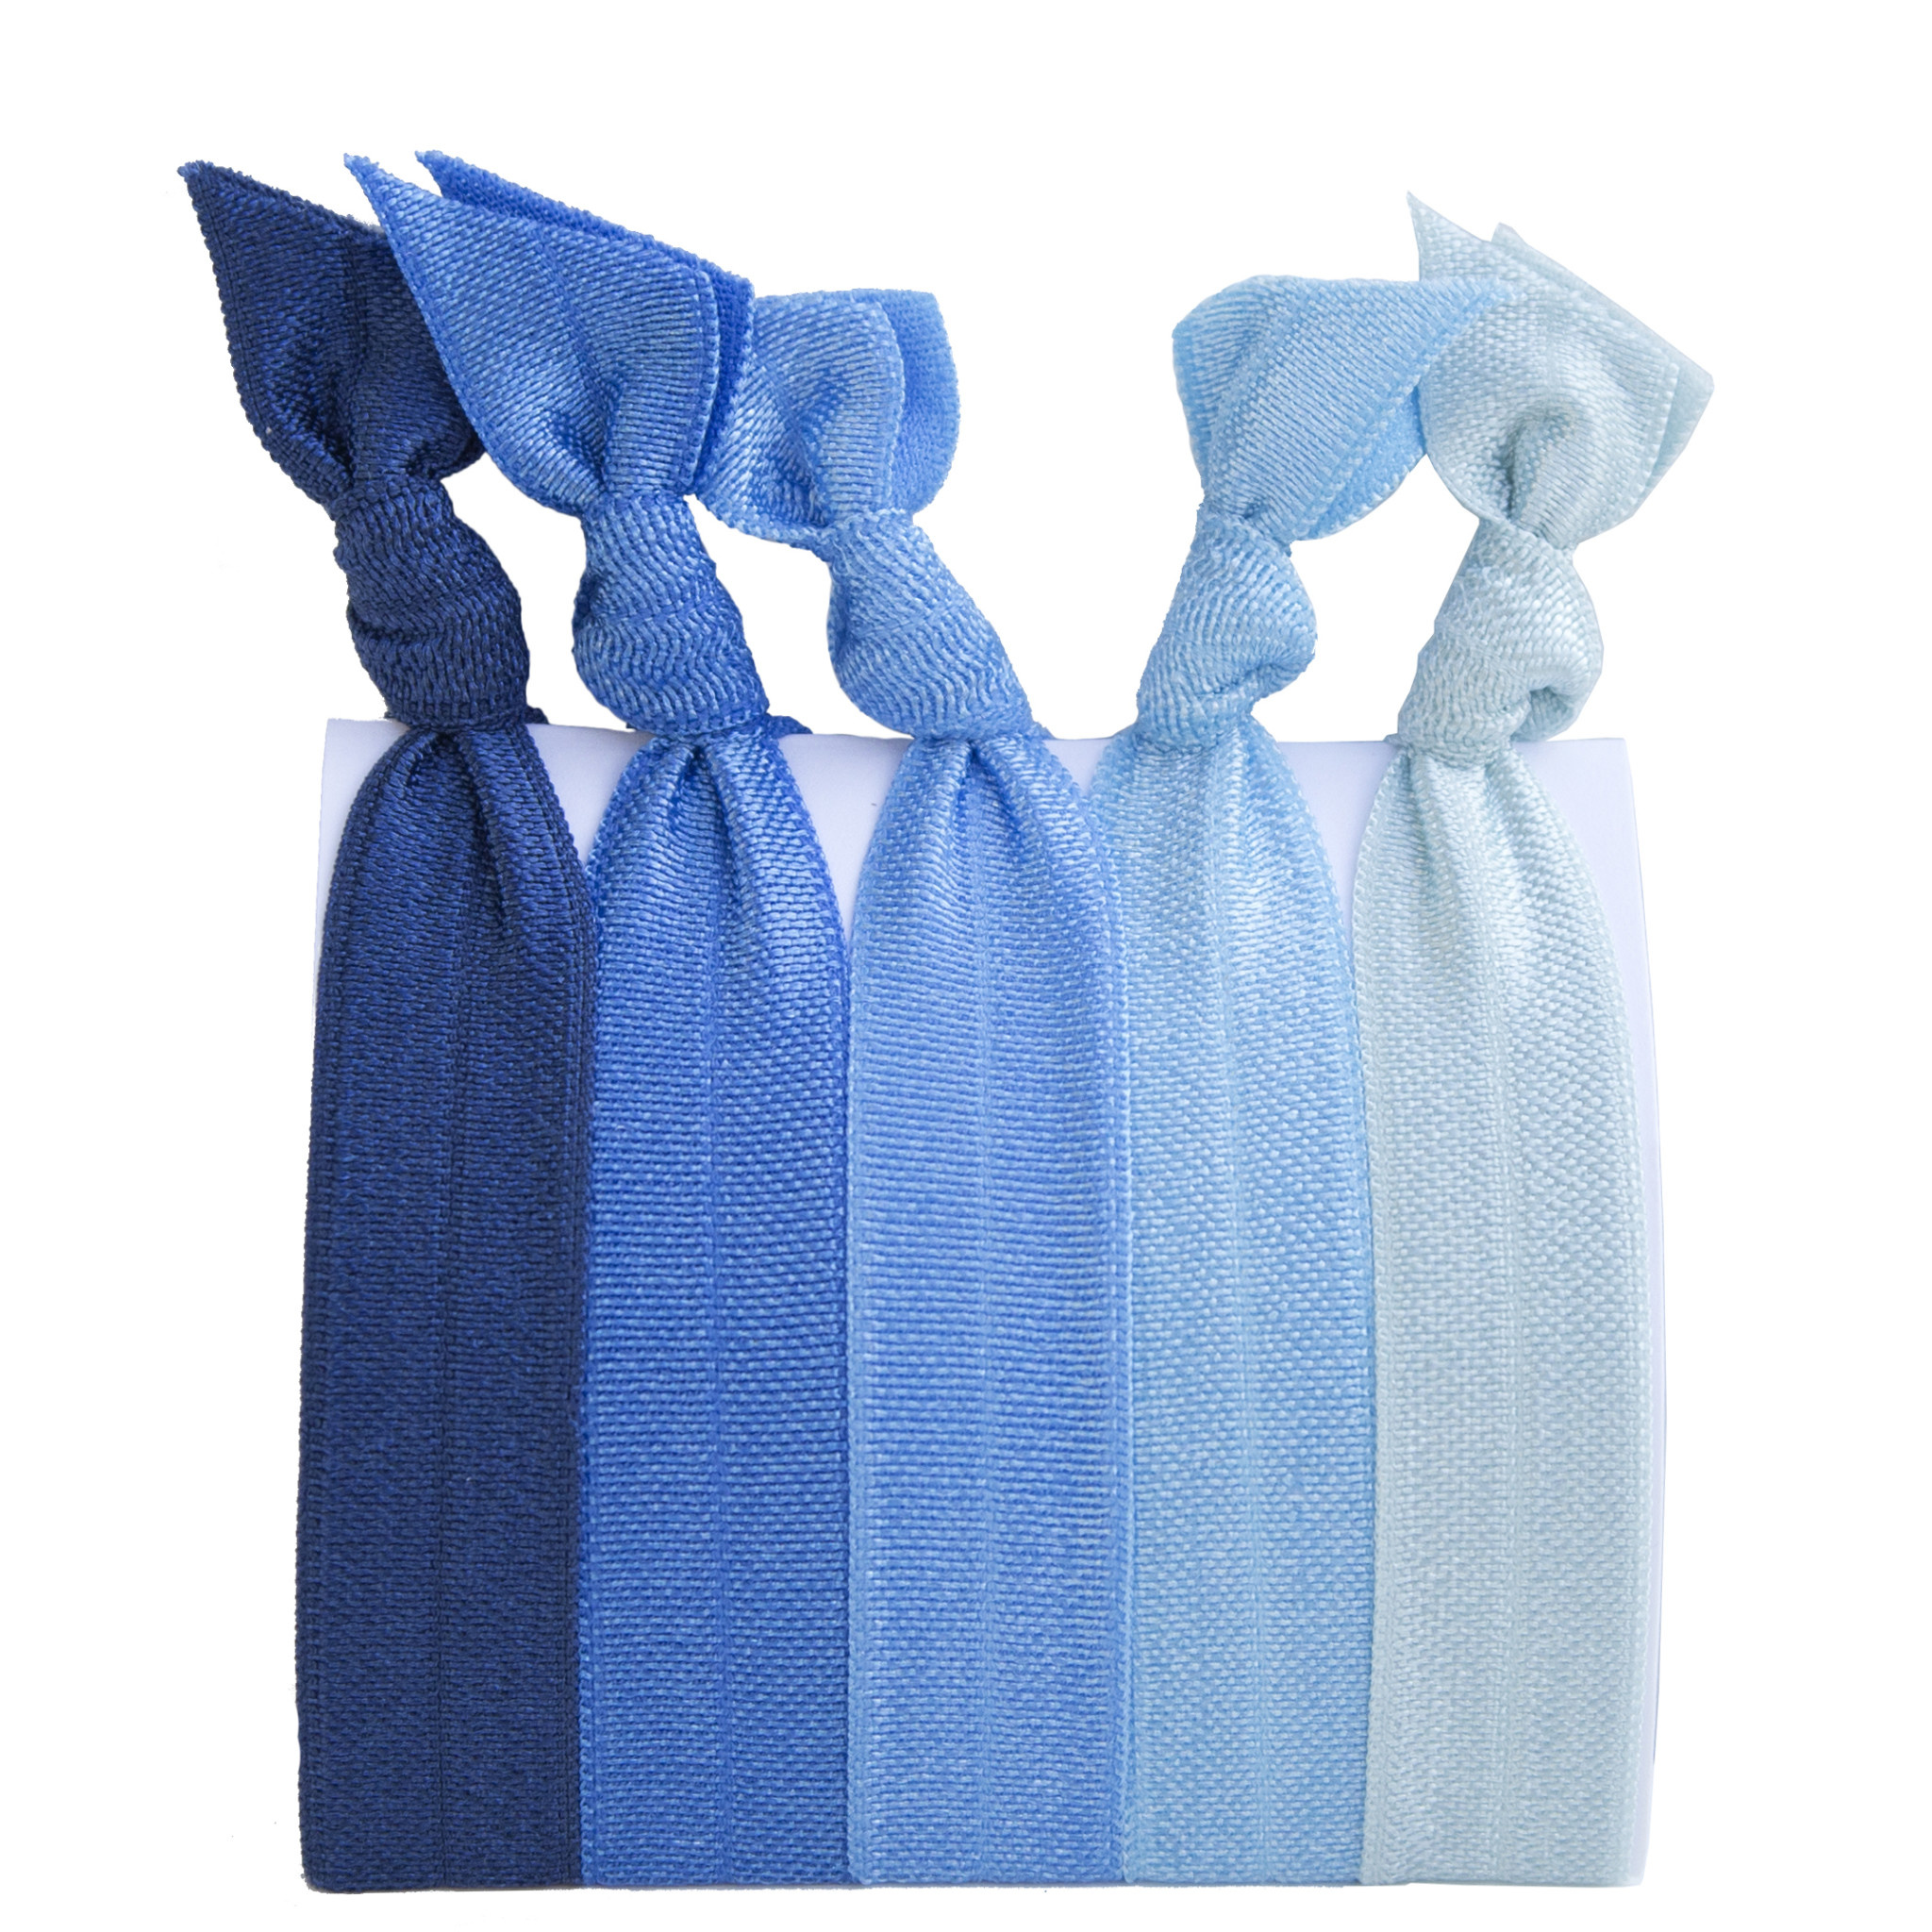 Daytrip Society Hair Ties Set of 5 - True Blue